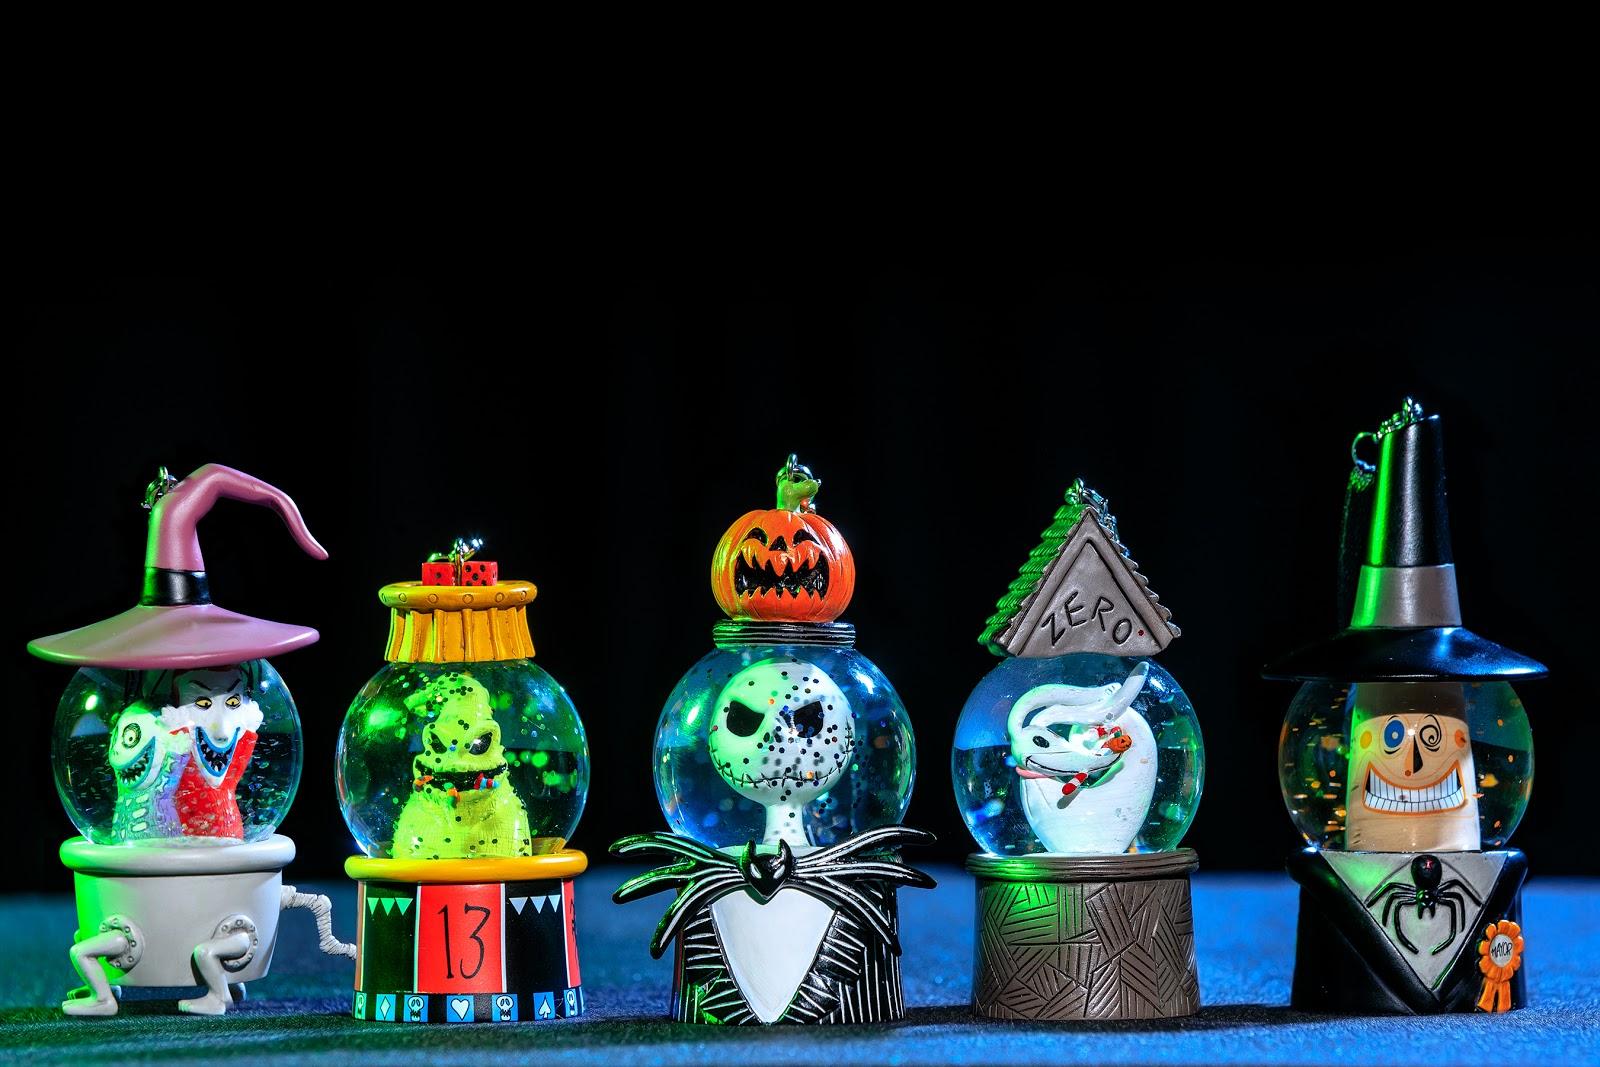 Disneyland Halloween 2020 Souvenirs New Disneyland Halloween Time and Oogie Boogie Bash Merchandise